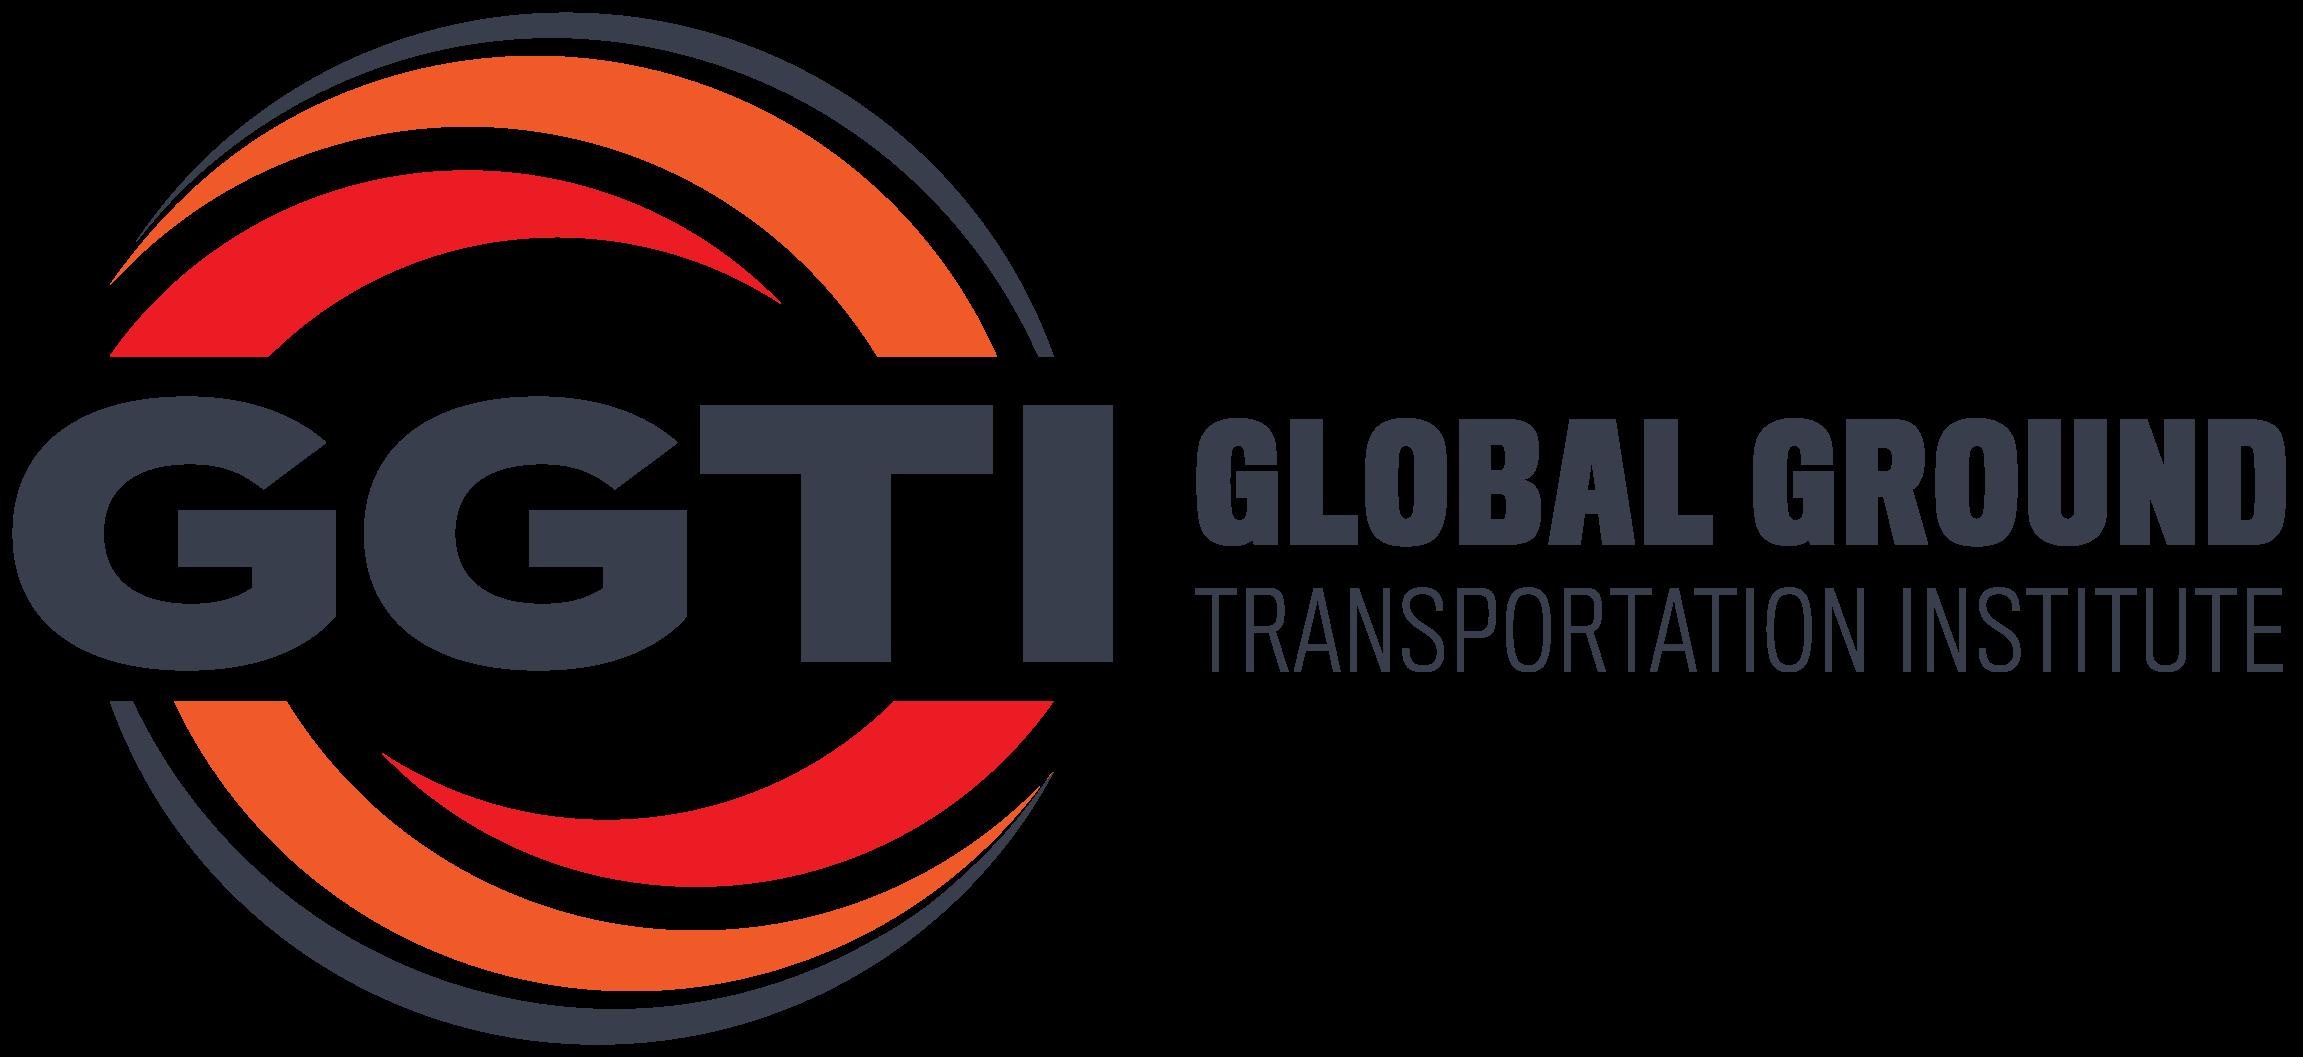 Global Ground Transportation Institute